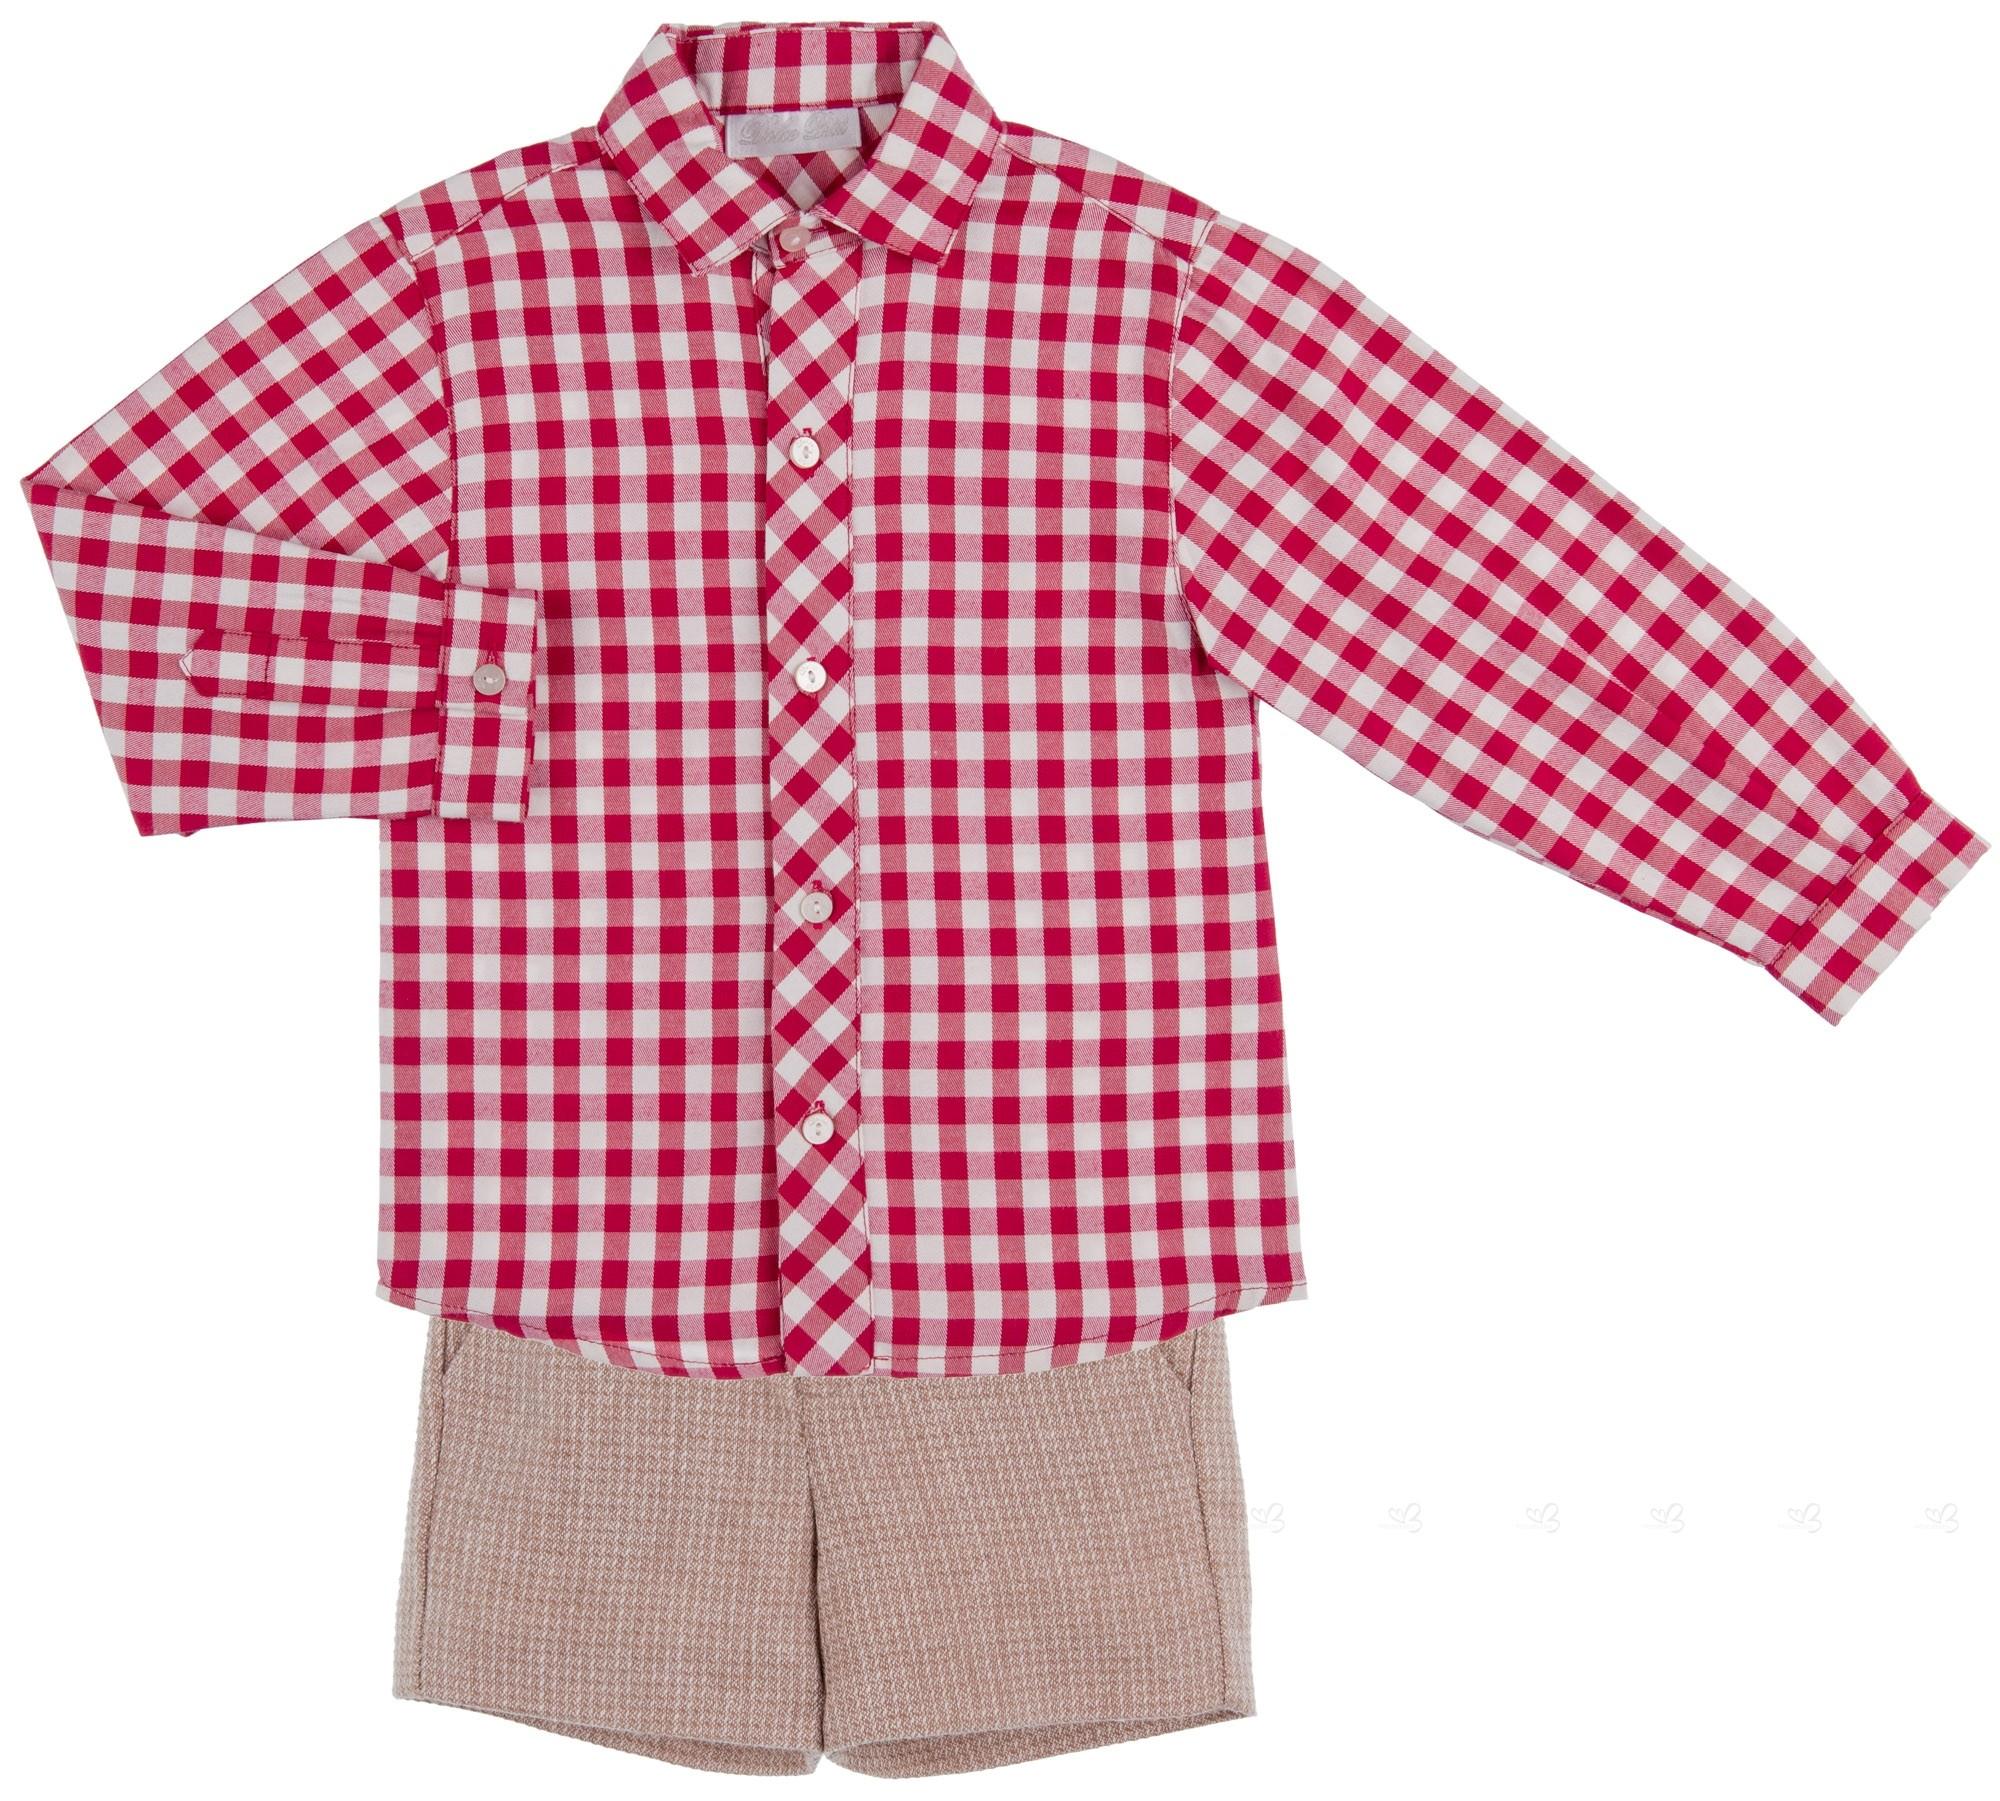 73b9de283443b Dolce Petit Conjunto Niño Camisa Cuadros Granate   Short Beige ...